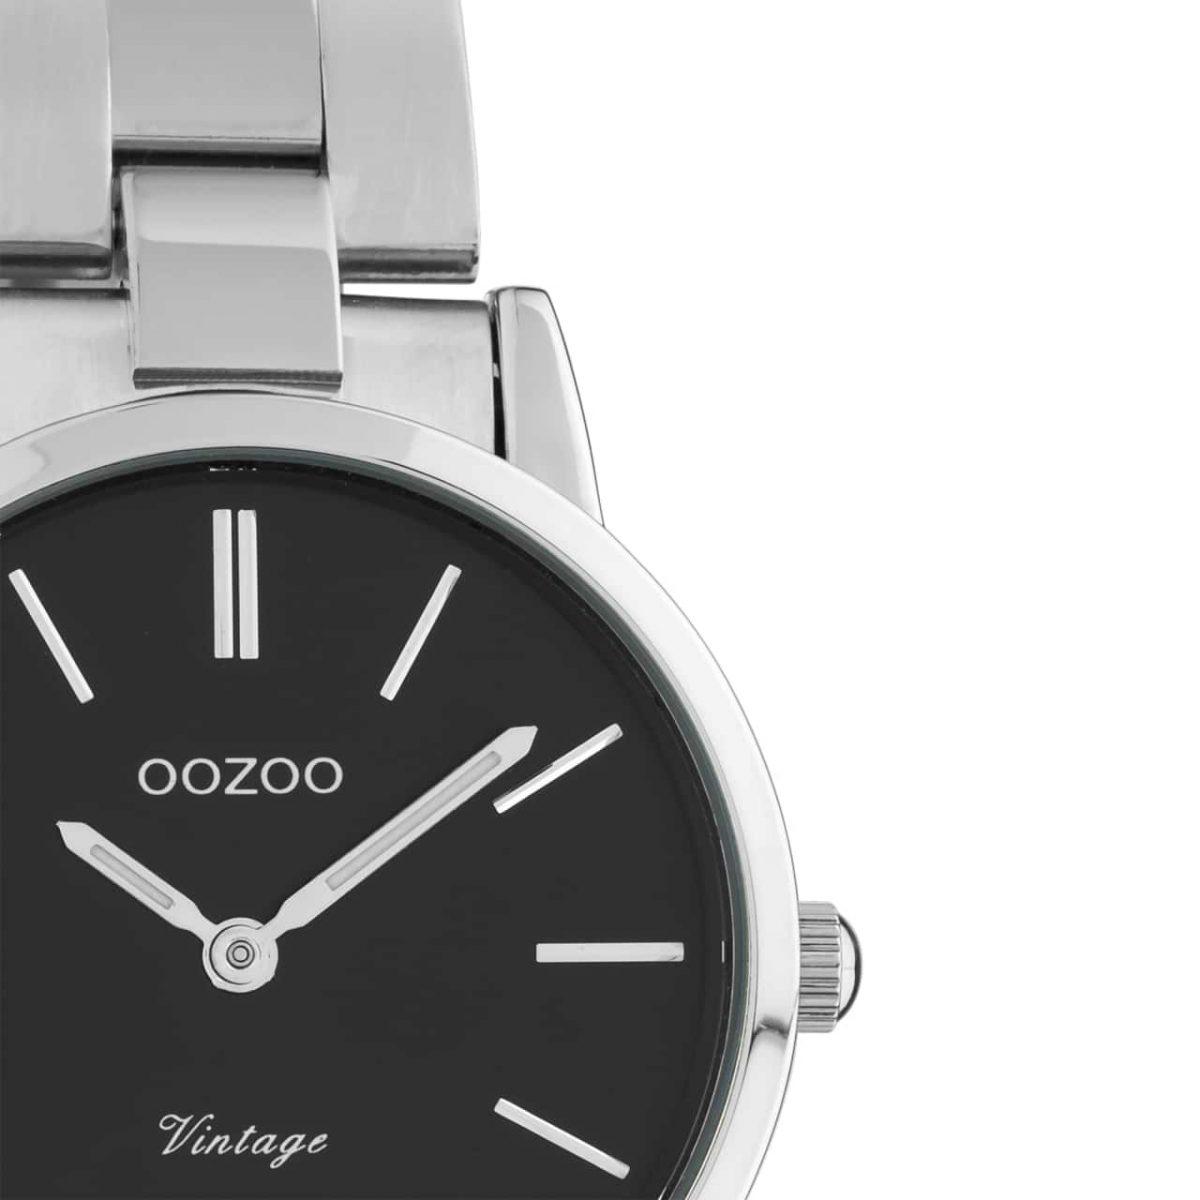 Vintage Summer 2020 - zilver/zwart - OOZOO